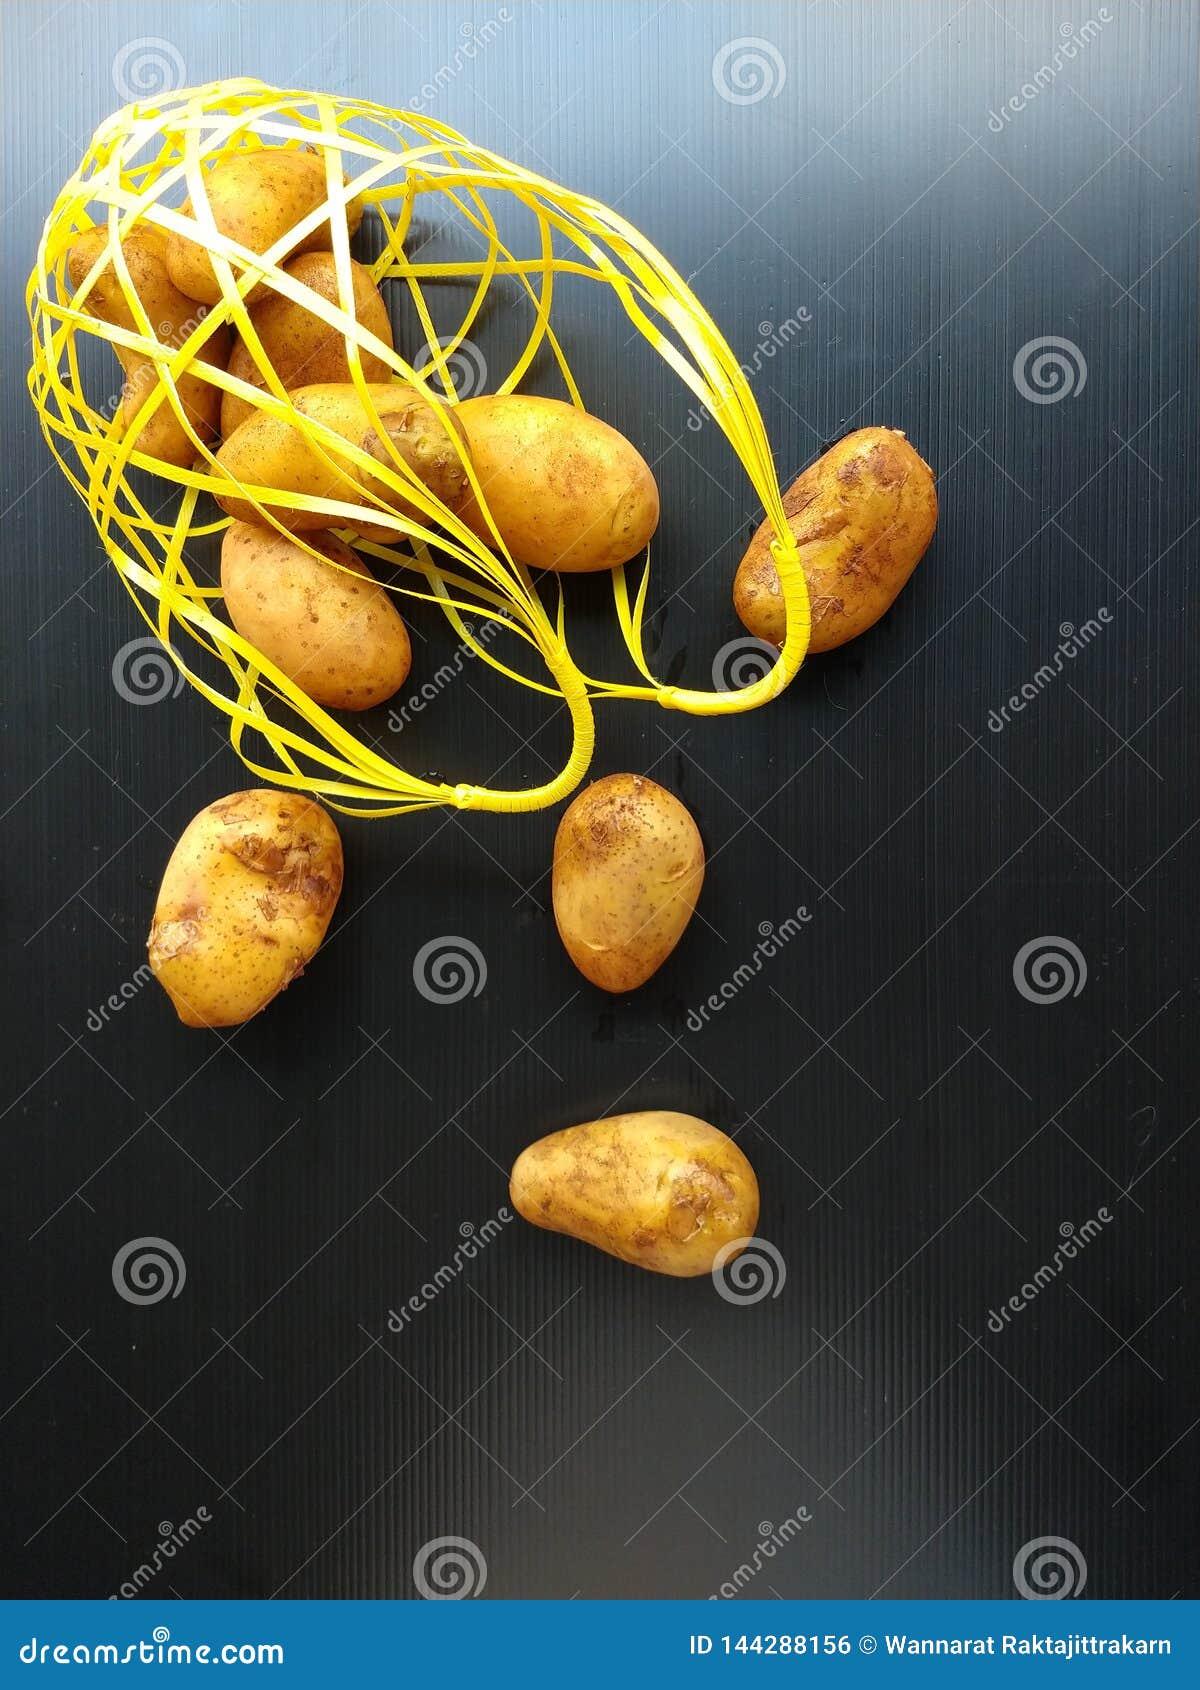 Verschütteter Kartoffelkorb